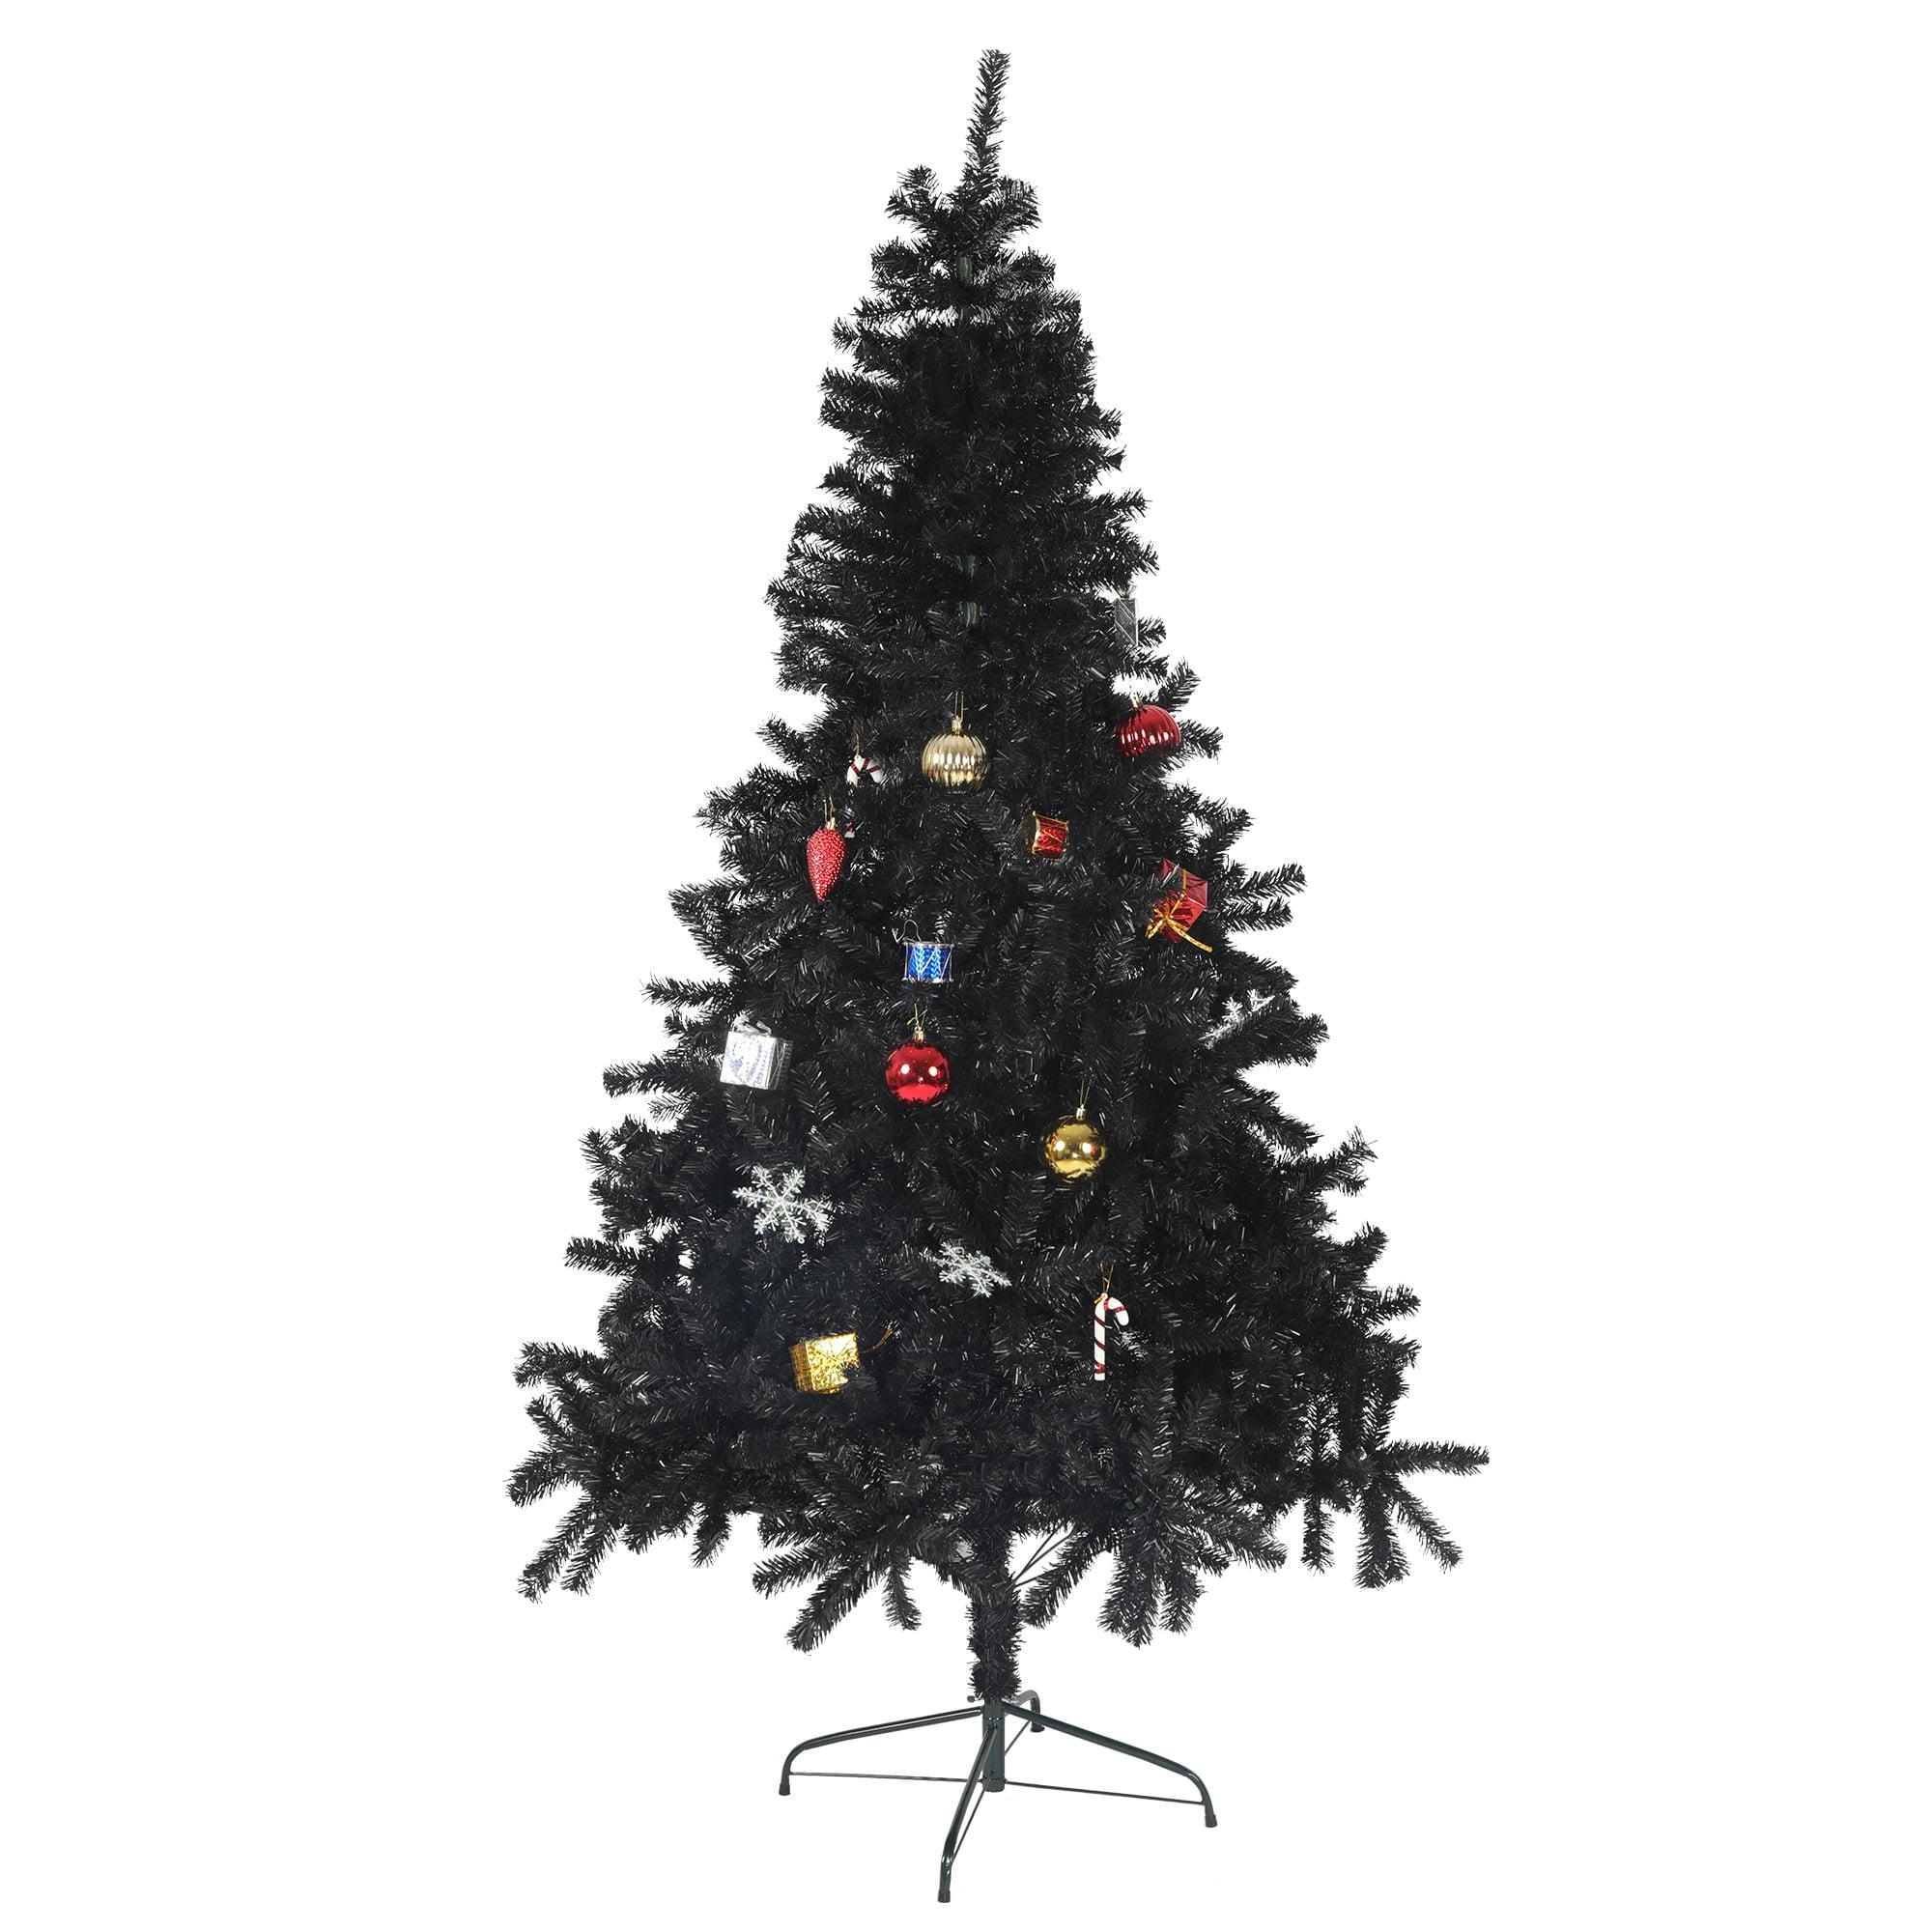 Karmas Product Black Artificial Tree 8 Feet Halloween Christmas Tree Artificial Pine Tree High Quality Pvc Branch With Sturdy Meatl Stand Walmart Com Walmart Com